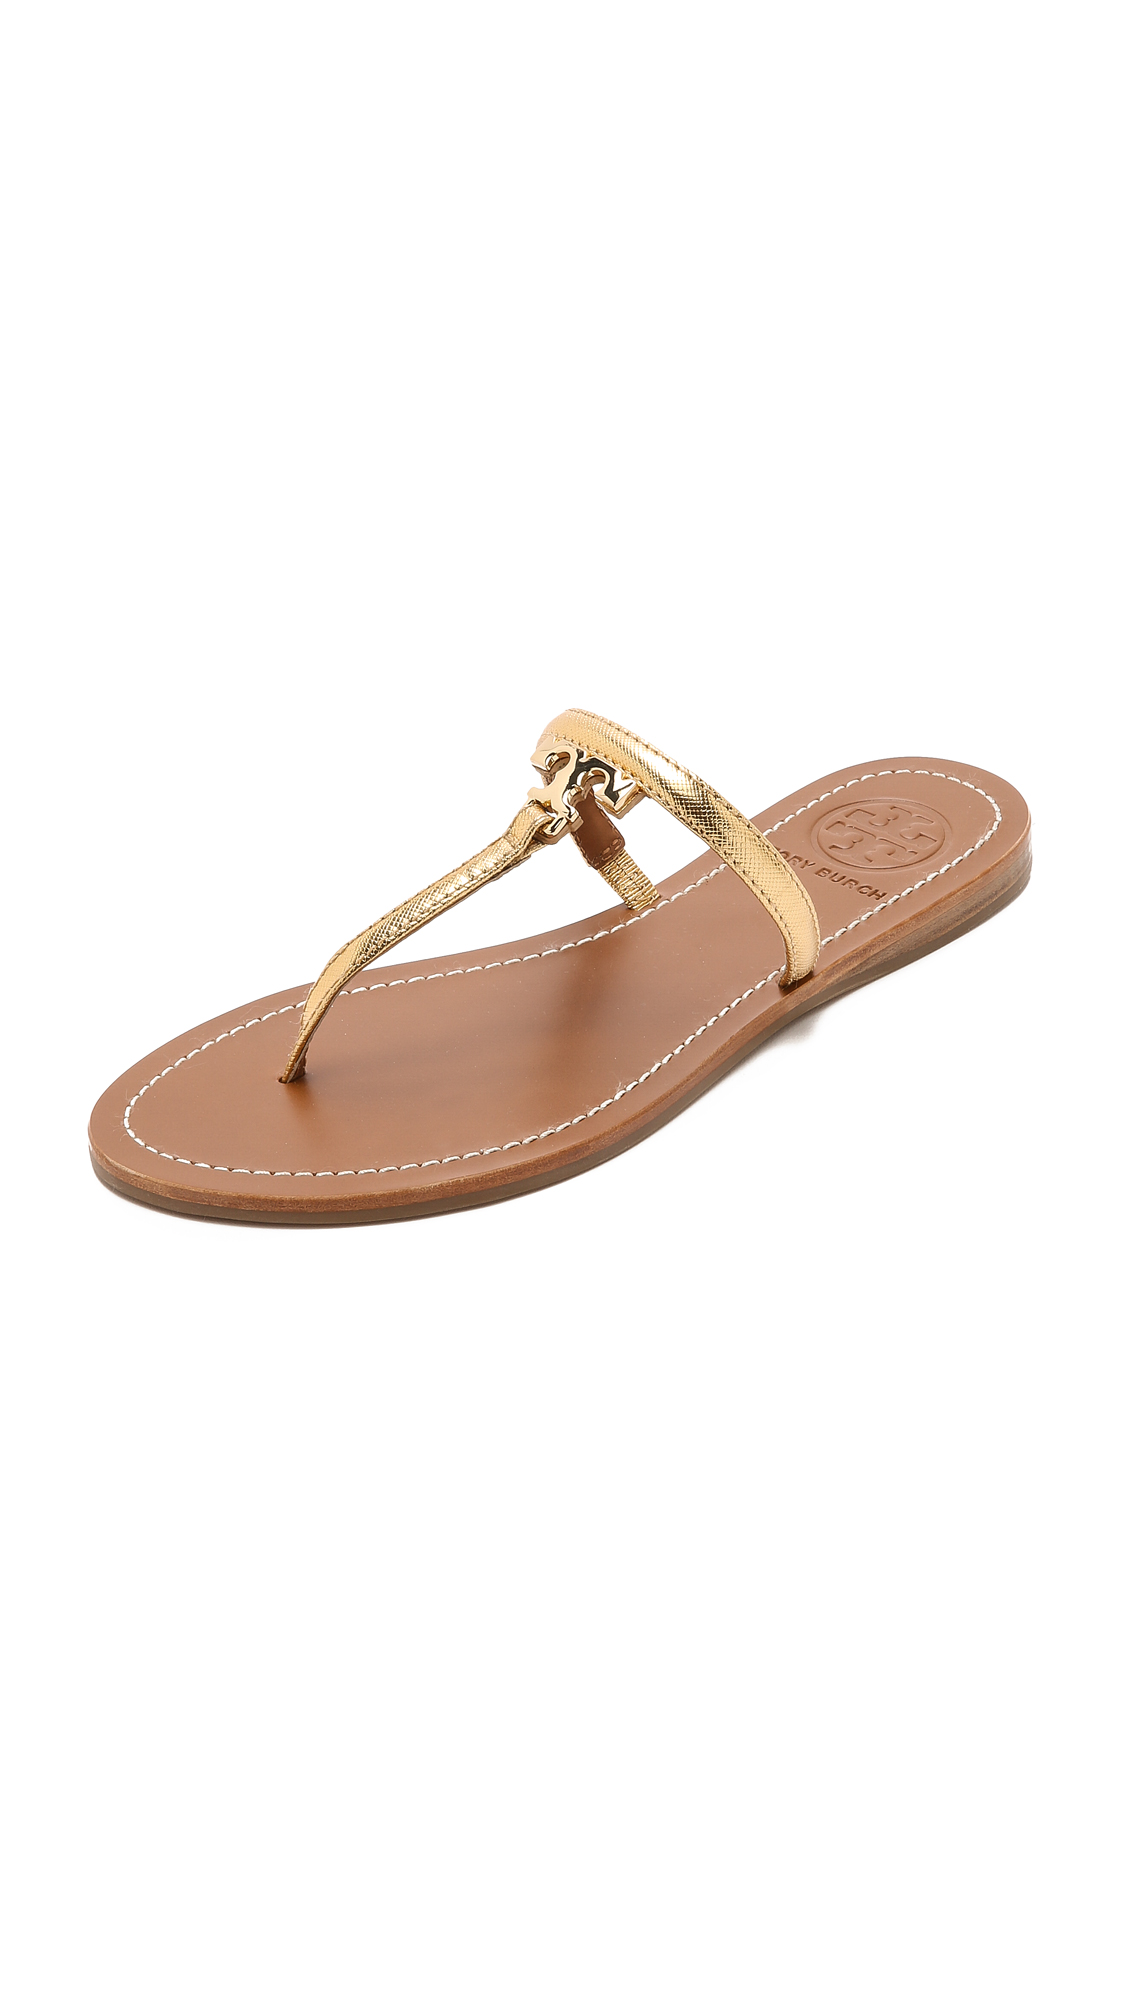 c2ae948ebaf4 Tory Burch T Logo Flat Thong Sandals on PopScreen